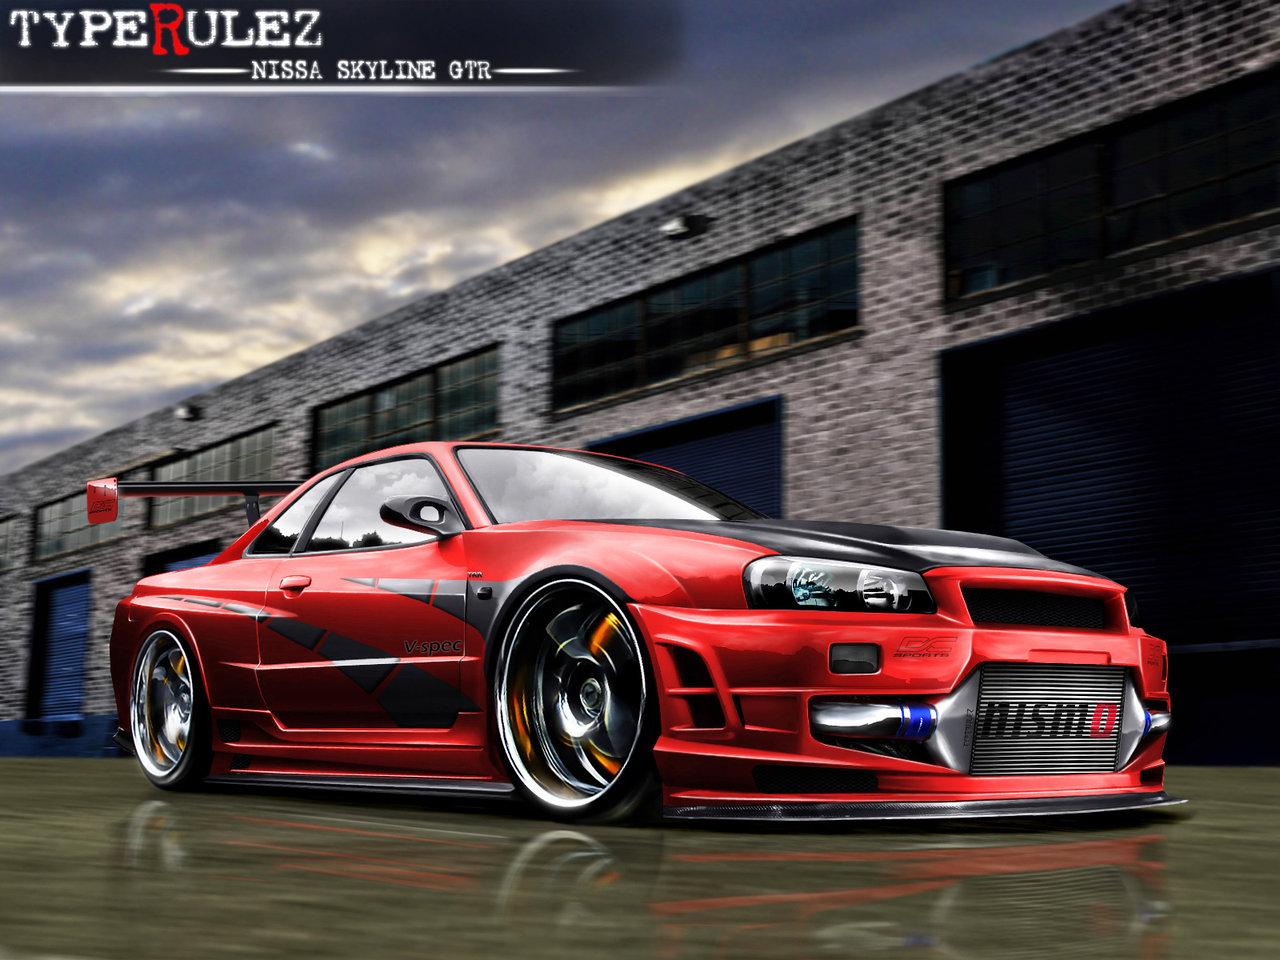 http://1.bp.blogspot.com/-L6vWo6_qSGk/Tk6FSsfyMyI/AAAAAAAADxo/swXXjZnVjO0/s1600/Nissan-Skyline-Cars+%25286%2529.jpg